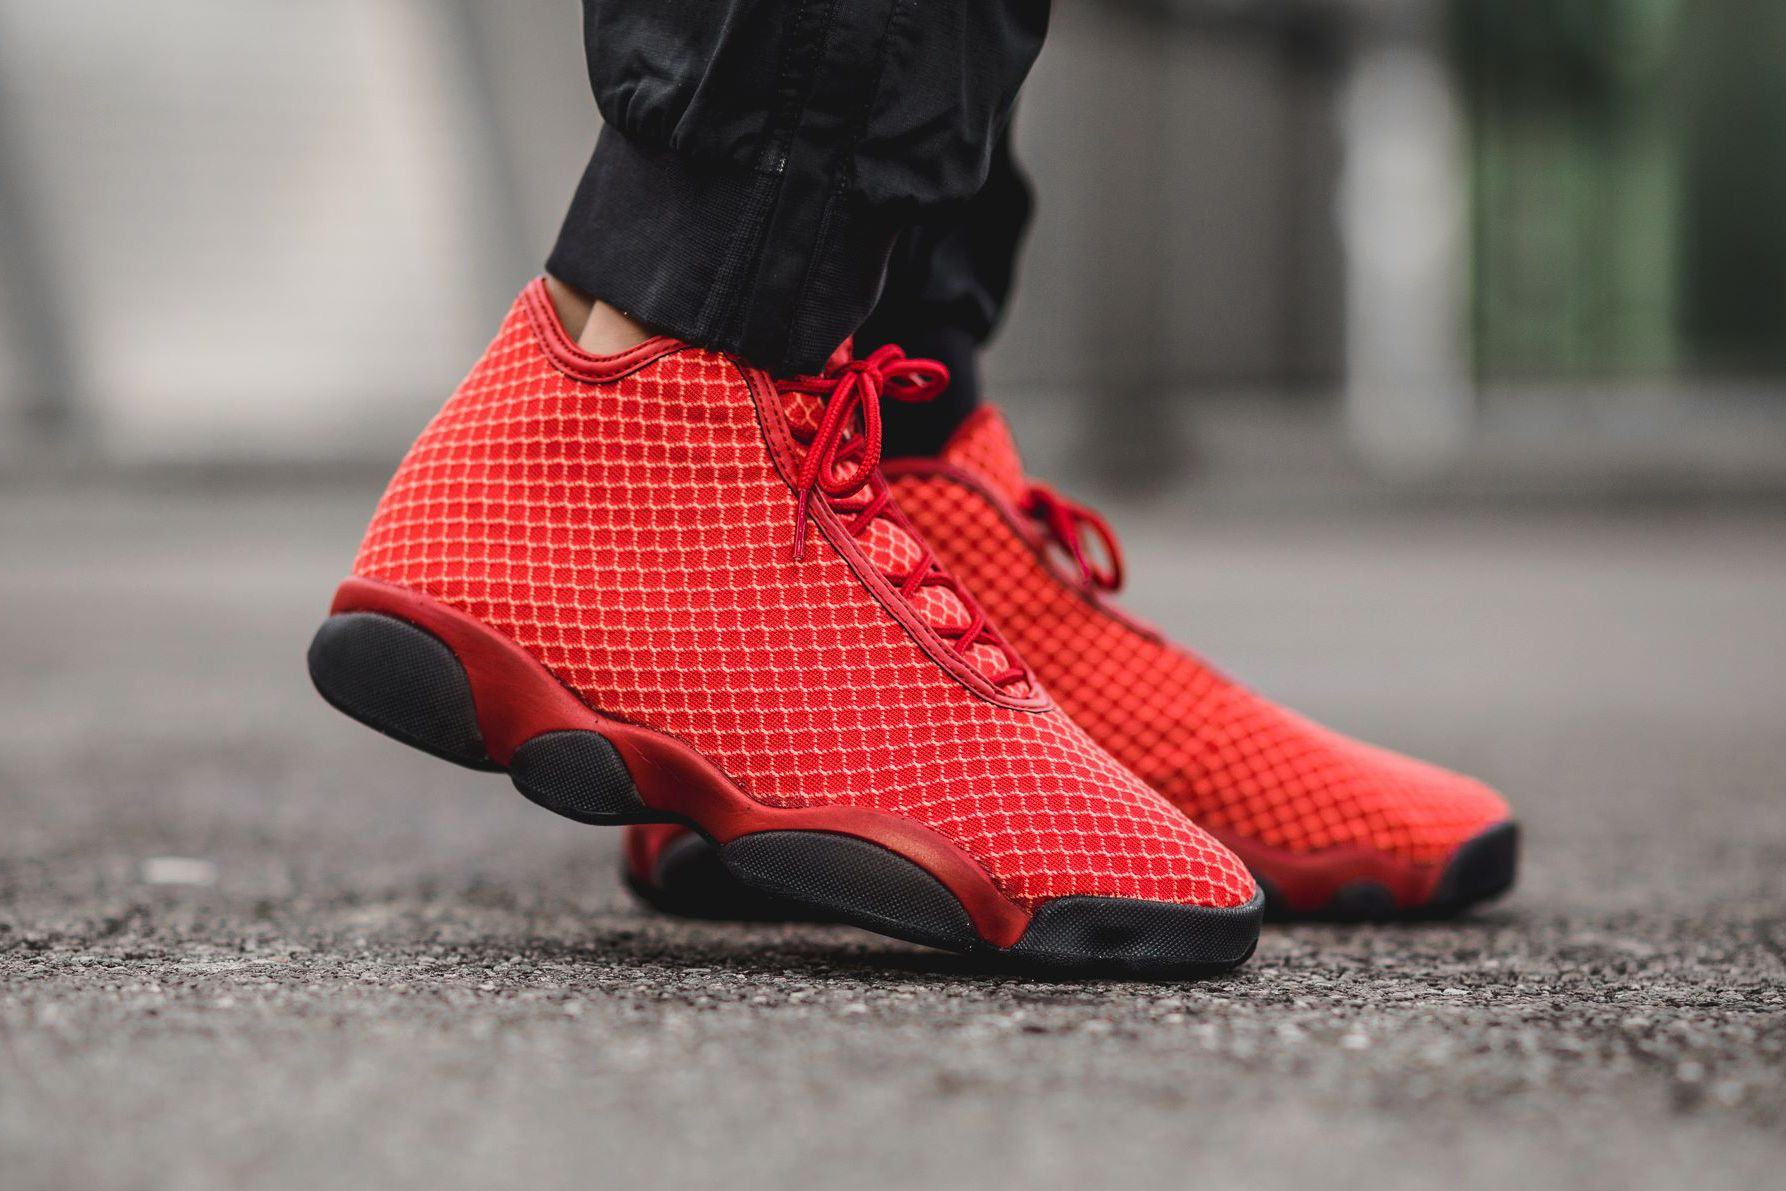 ... jordan horizon gym red infrared black eu kicks sneaker magazine street  sneakers pinterest gym magazi caed4281b